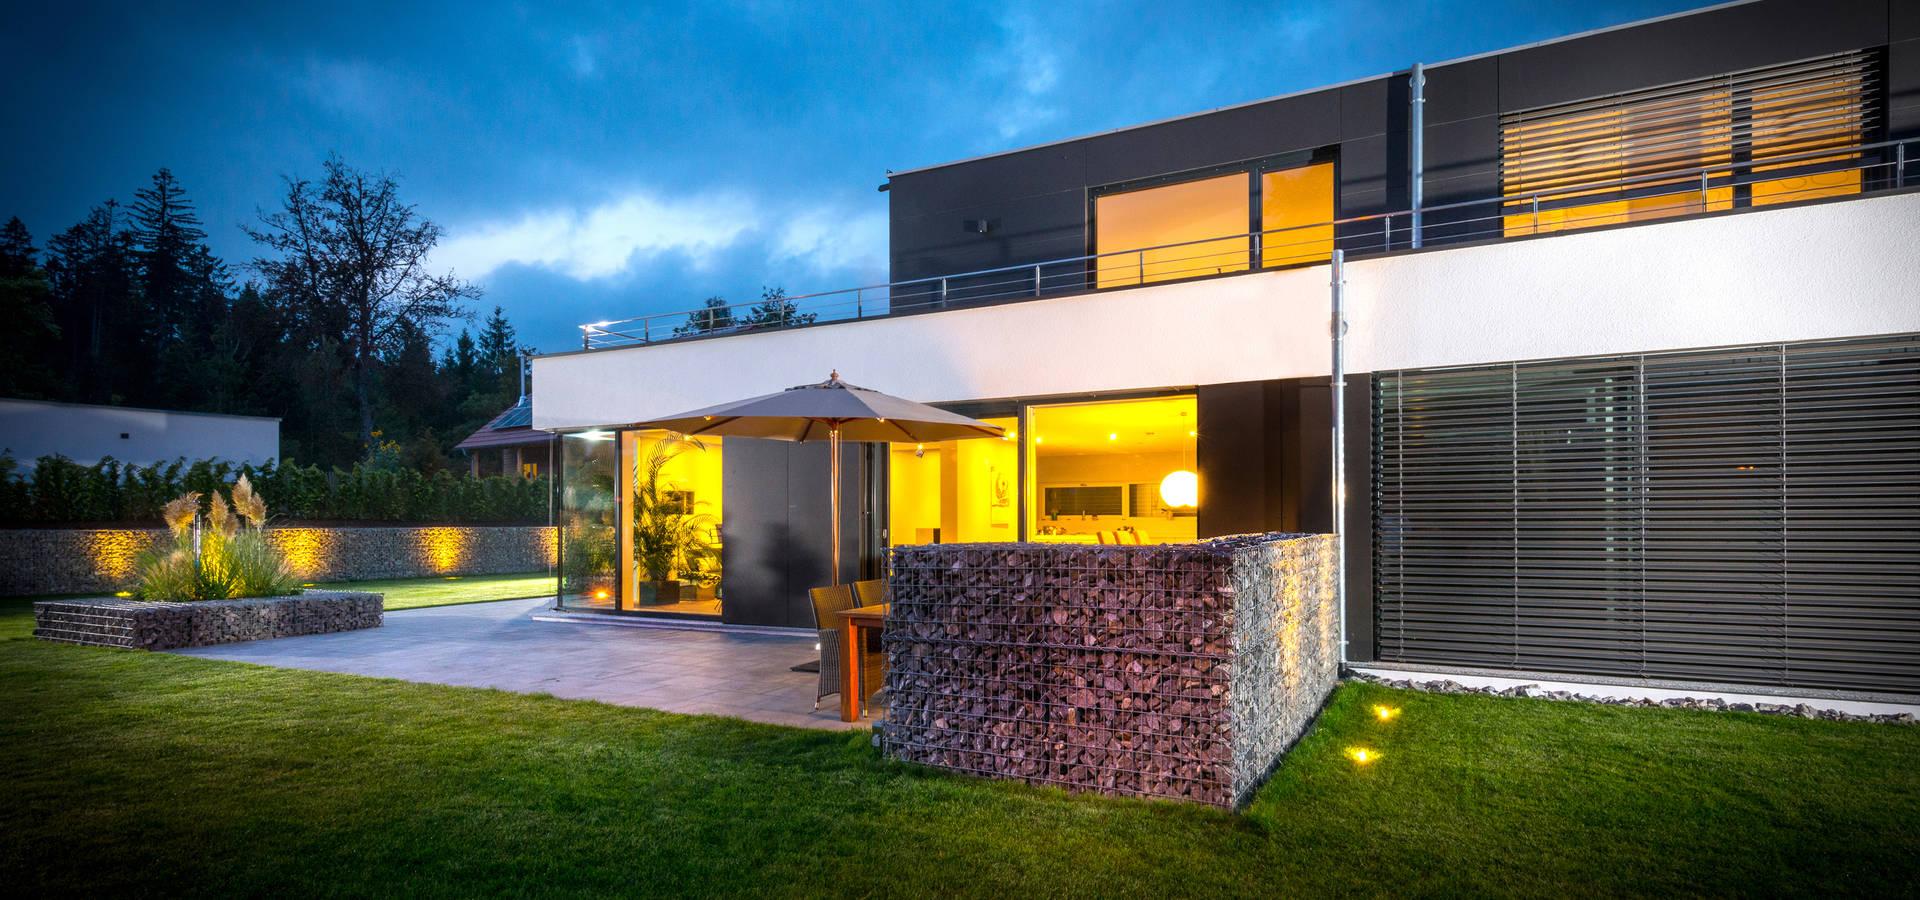 Architekturbüro Ketterer